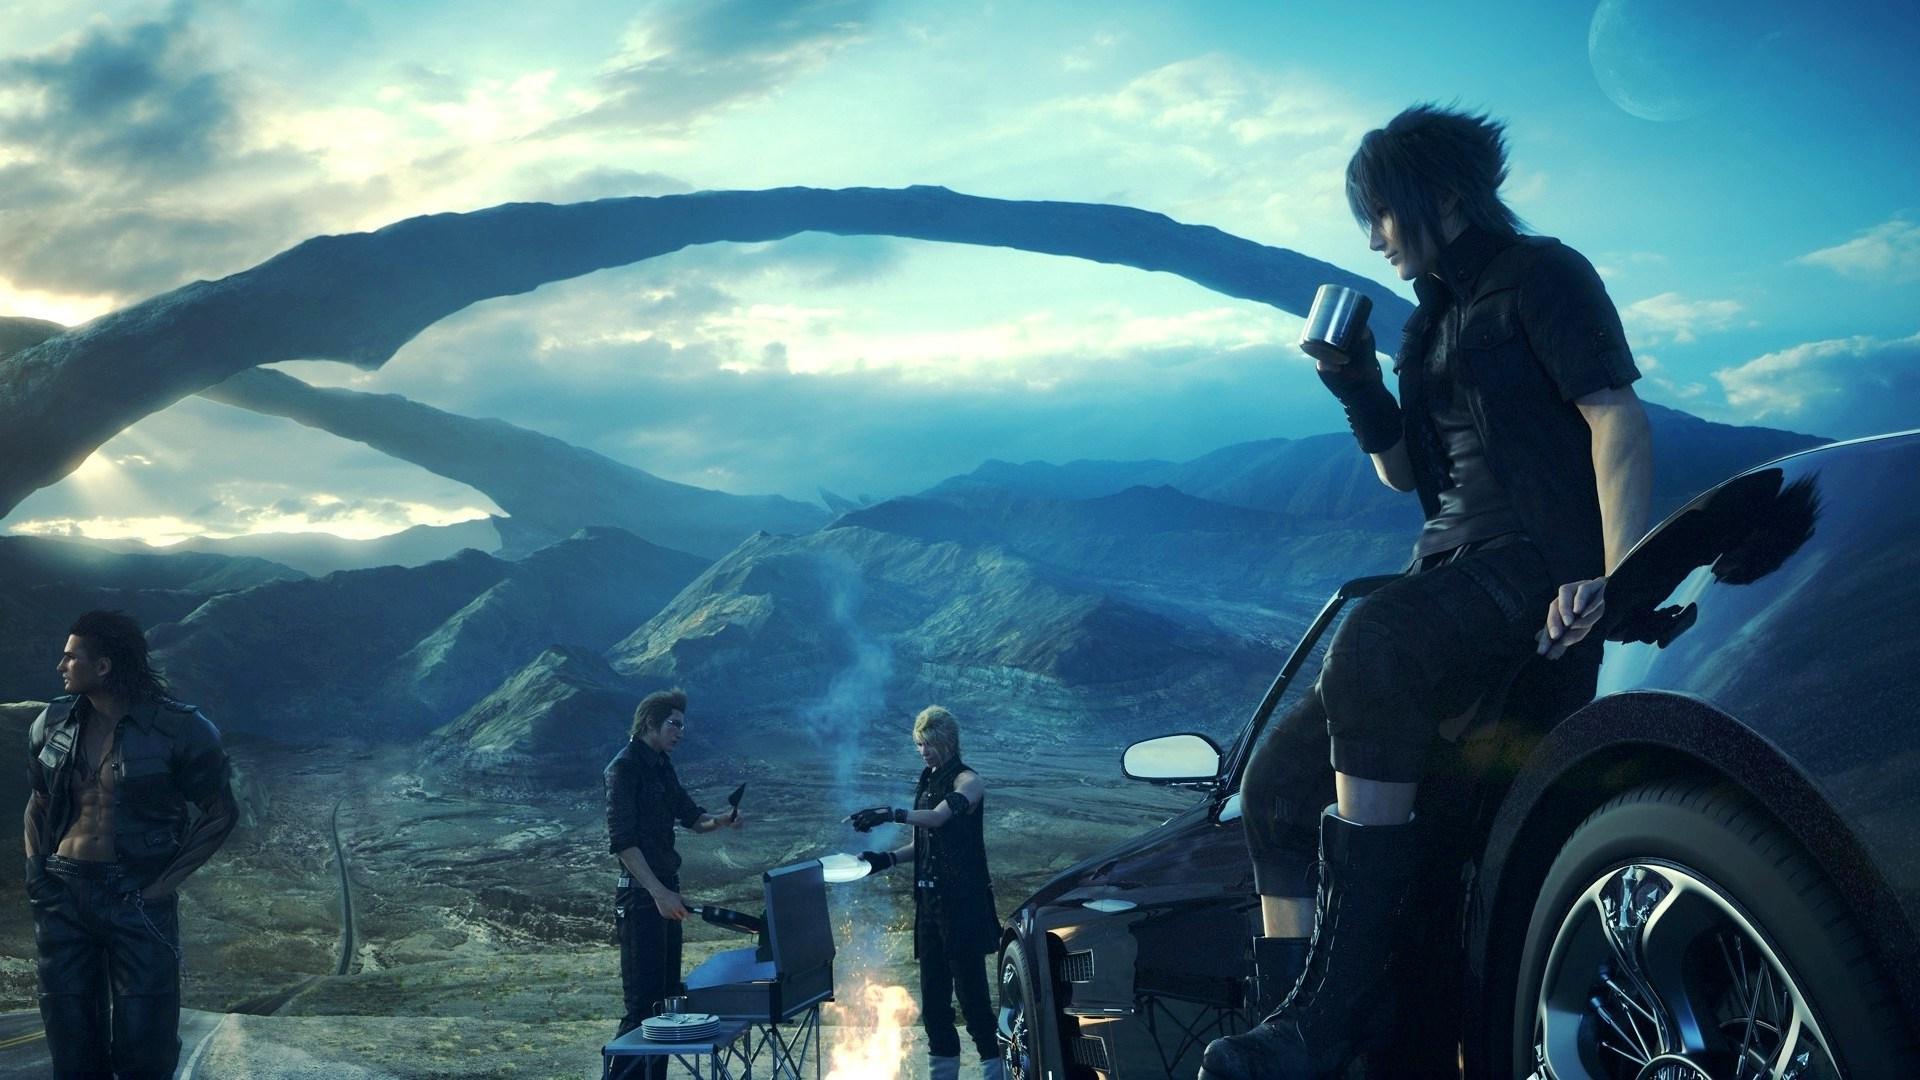 Final-Fantasy-XV-Wallpaper-Images